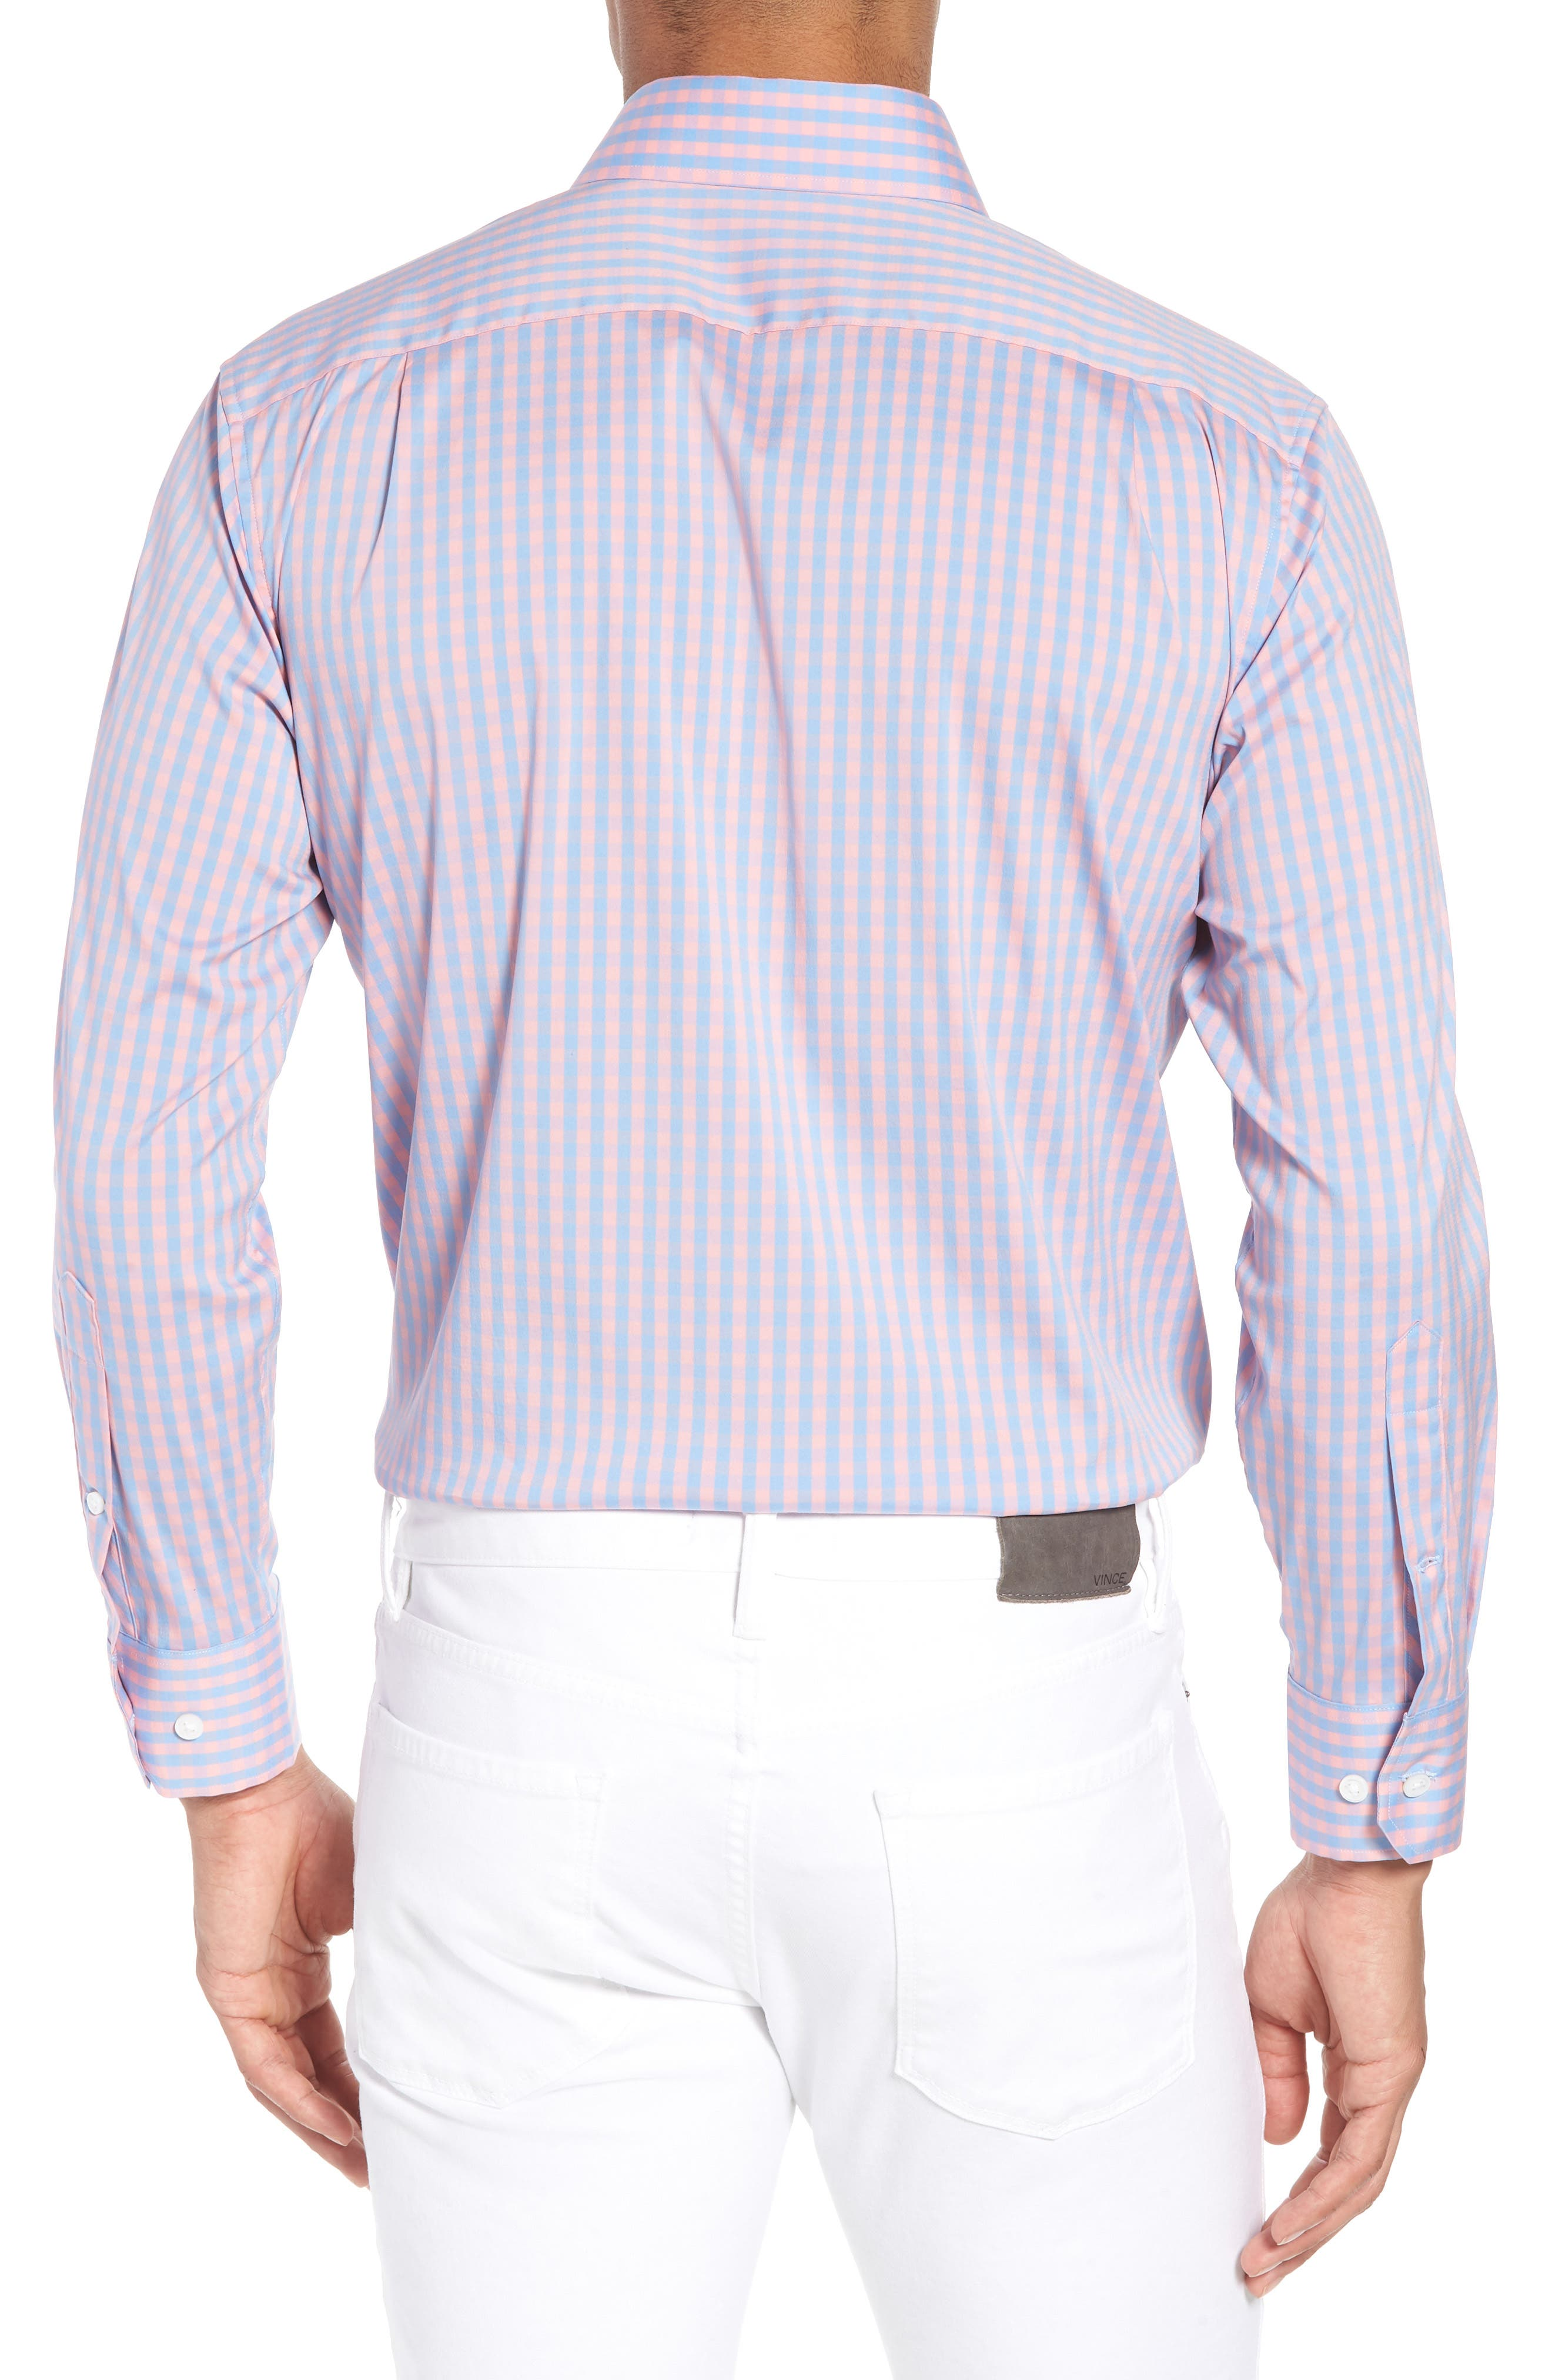 Jetsetter Slim Fit Stretch Check Dress Shirt,                             Alternate thumbnail 3, color,                             650